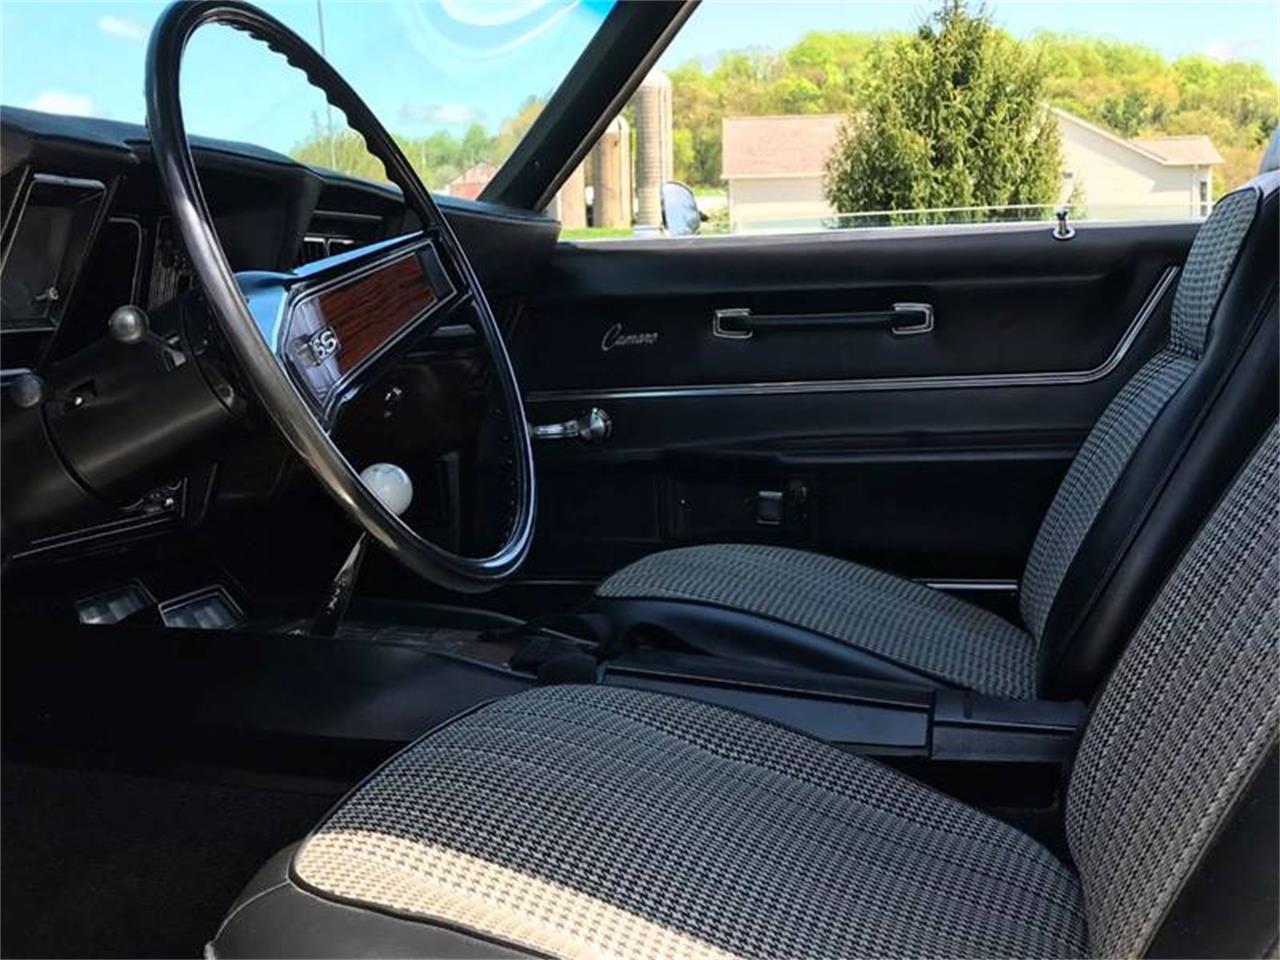 Large Picture of 1969 Camaro located in Orville Ohio - $54,900.00 - Q6KC